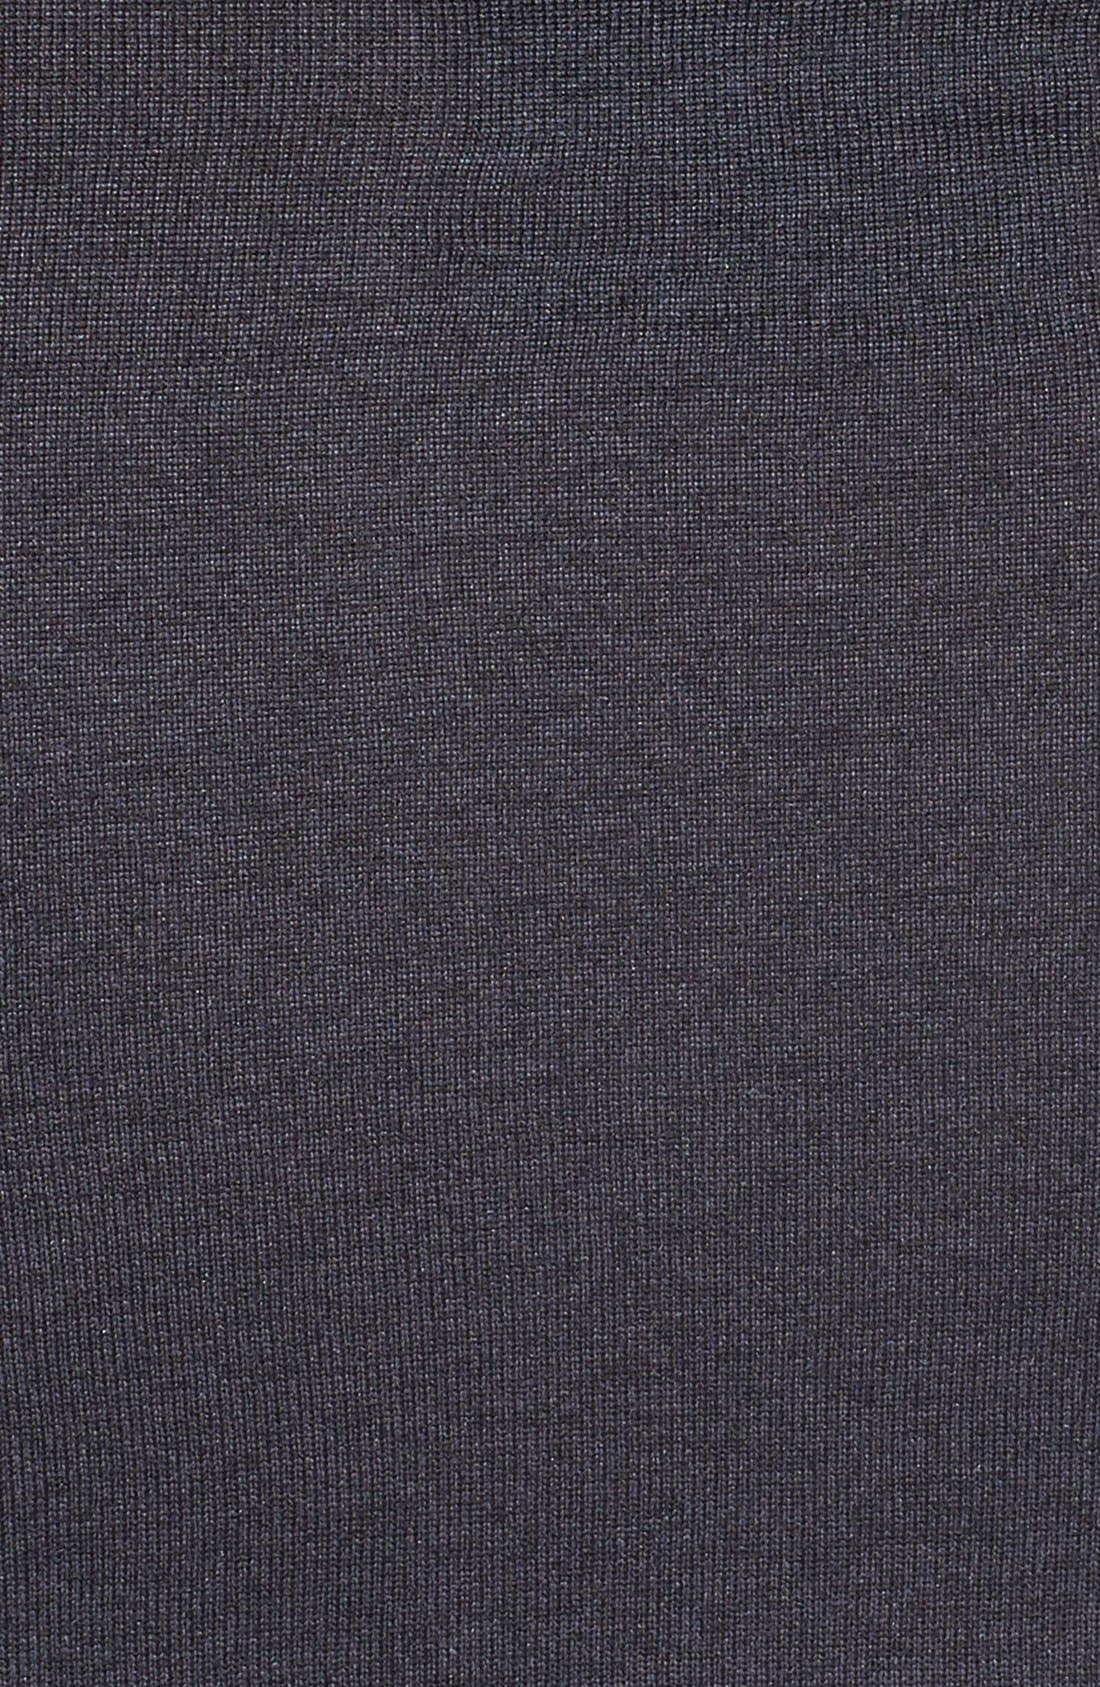 Alternate Image 4  - Nike 'Legend' Dri-FIT V-Neck Long Sleeve Sport Top